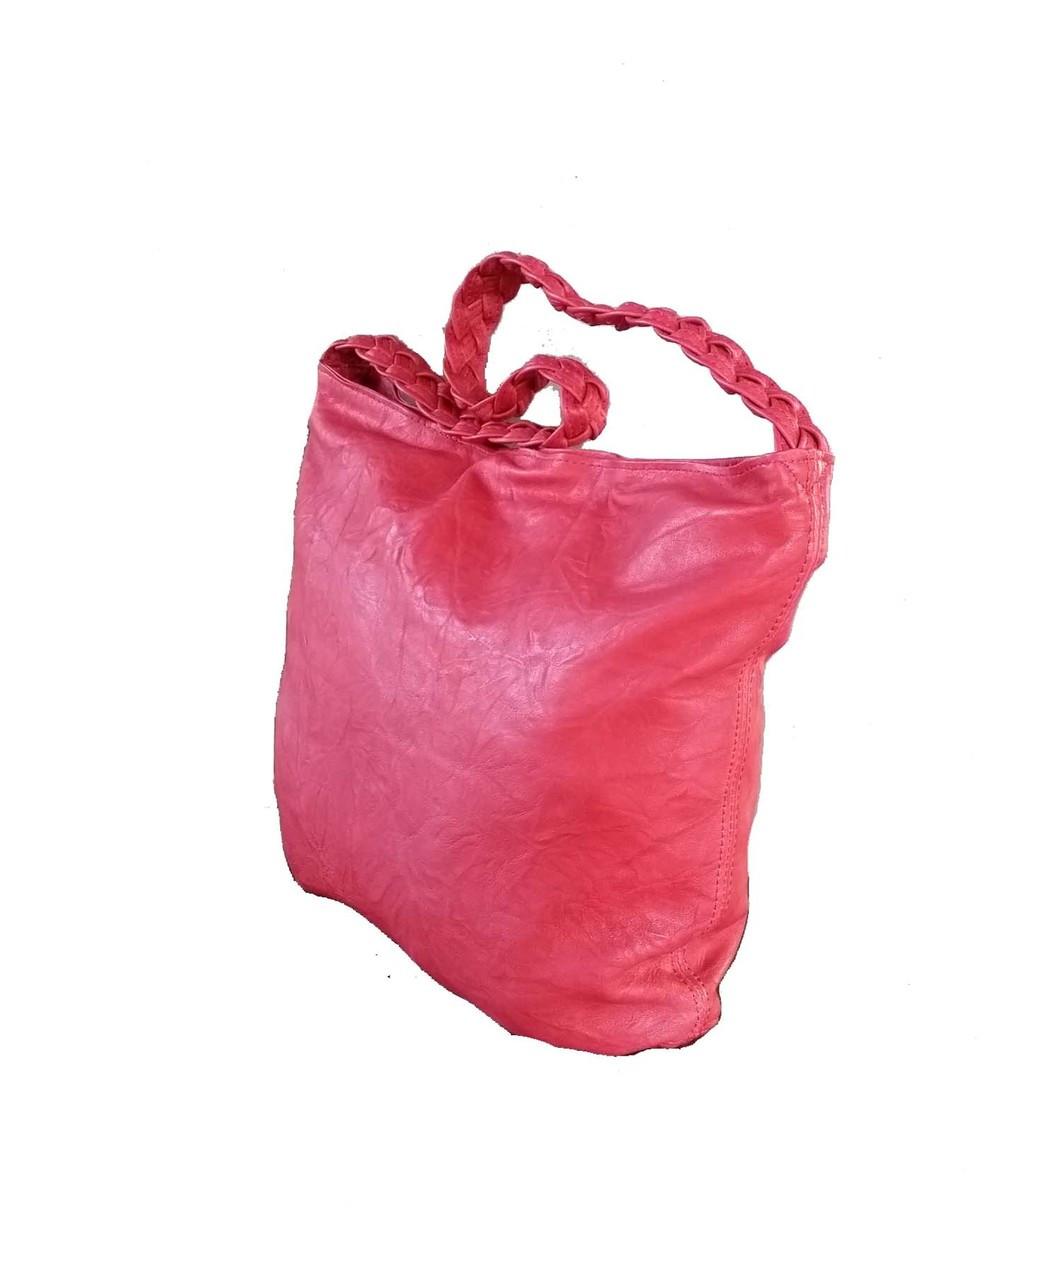 Boho Chic Red Leather Ho bo Bag - Braided Handle Purse - Bohemian Shoulder  Handbag claudia - Fgalaze Genuine Leather Bags   Accessories 487053d830394